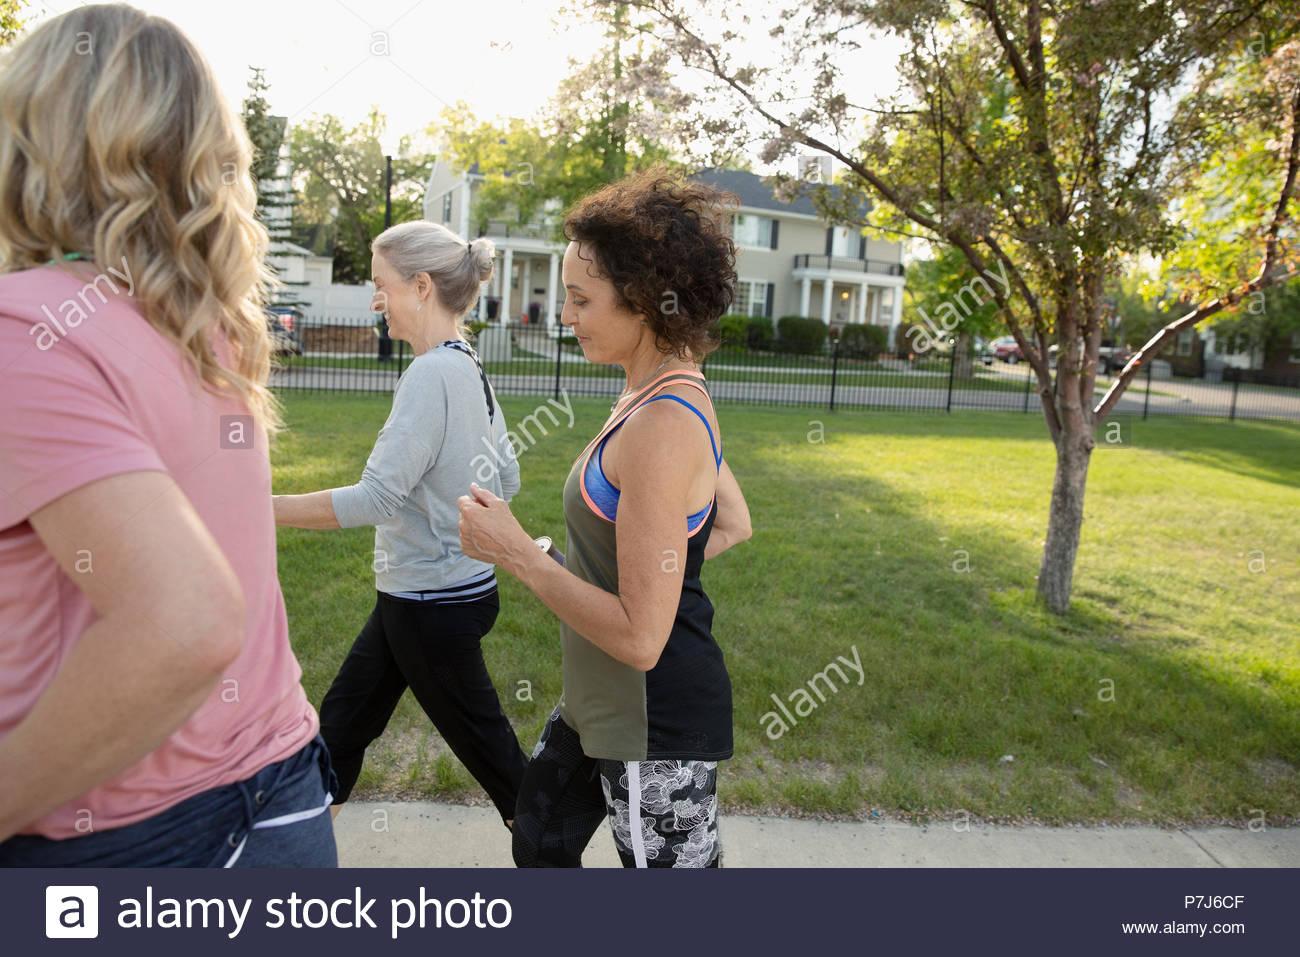 Senior women walking, exercising in park - Stock Image